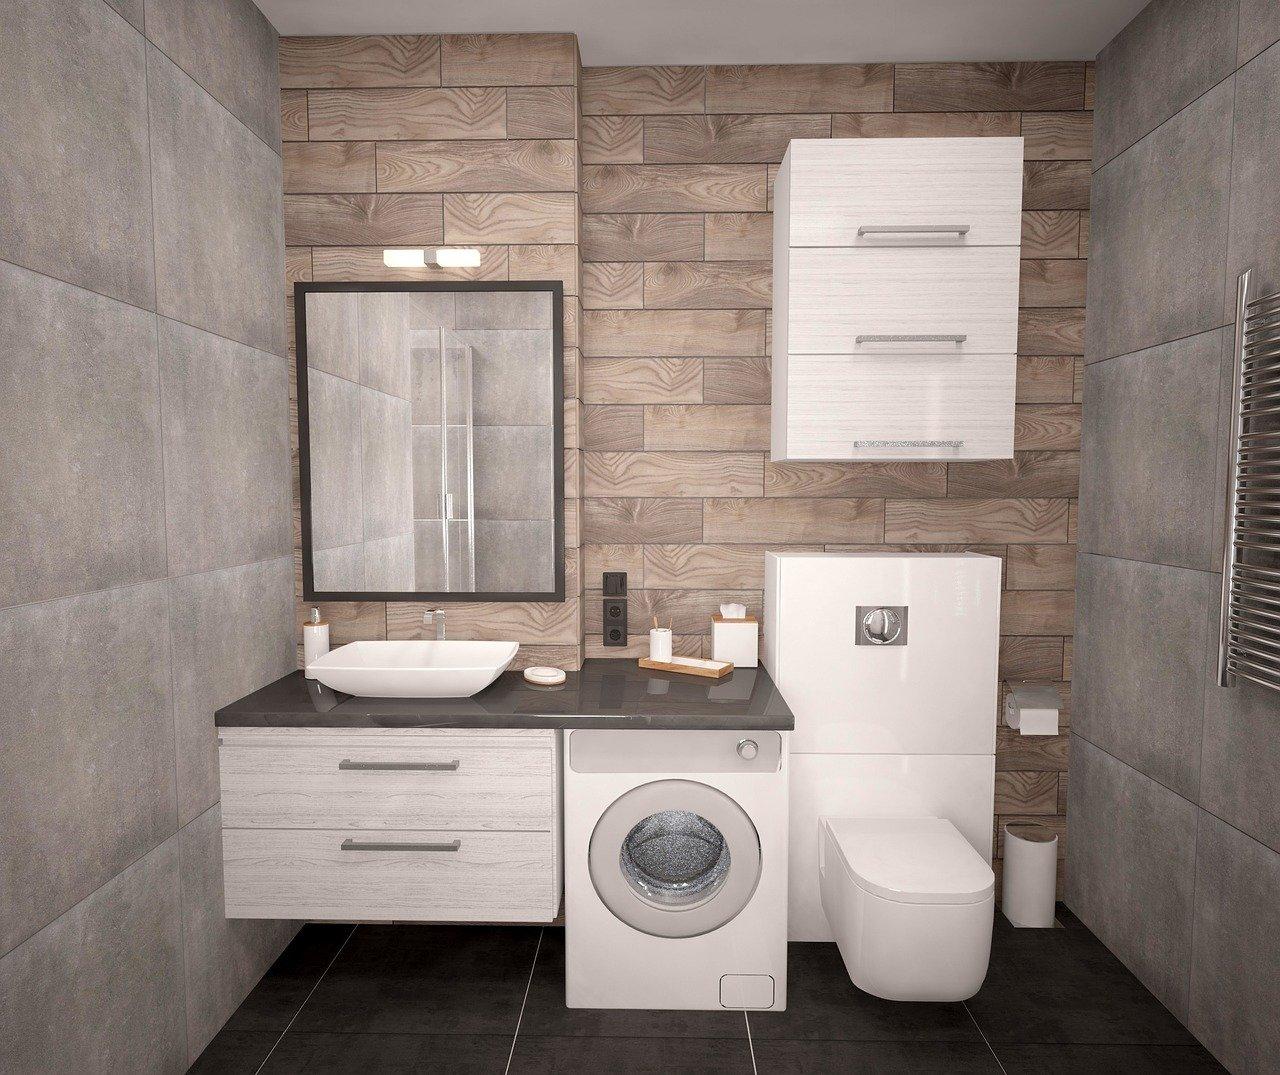 Mobile Bagno Ikea Immagini mobili bagno sospesi: ikea, leroy merlin, mondoconvenienza e